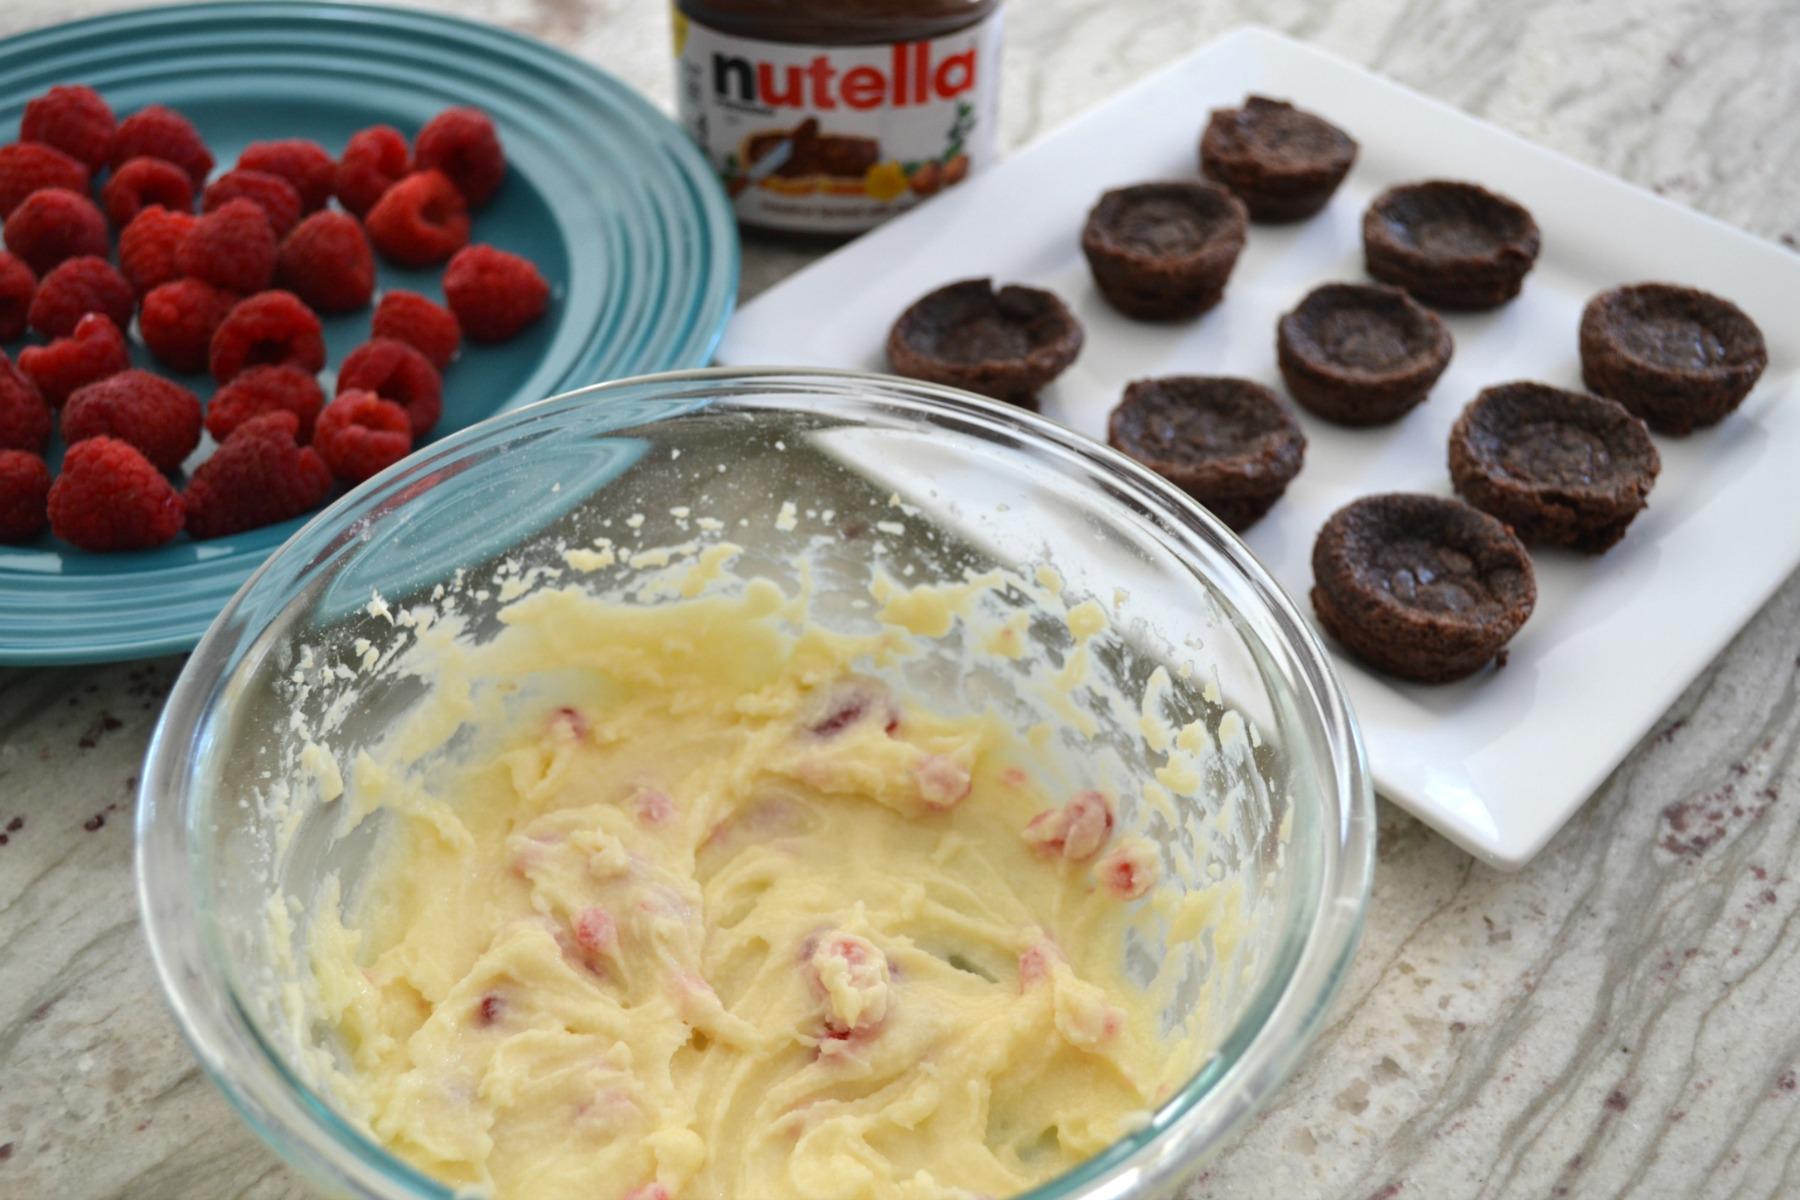 brownie bites, raspberry, nutella, mascarpone cheese